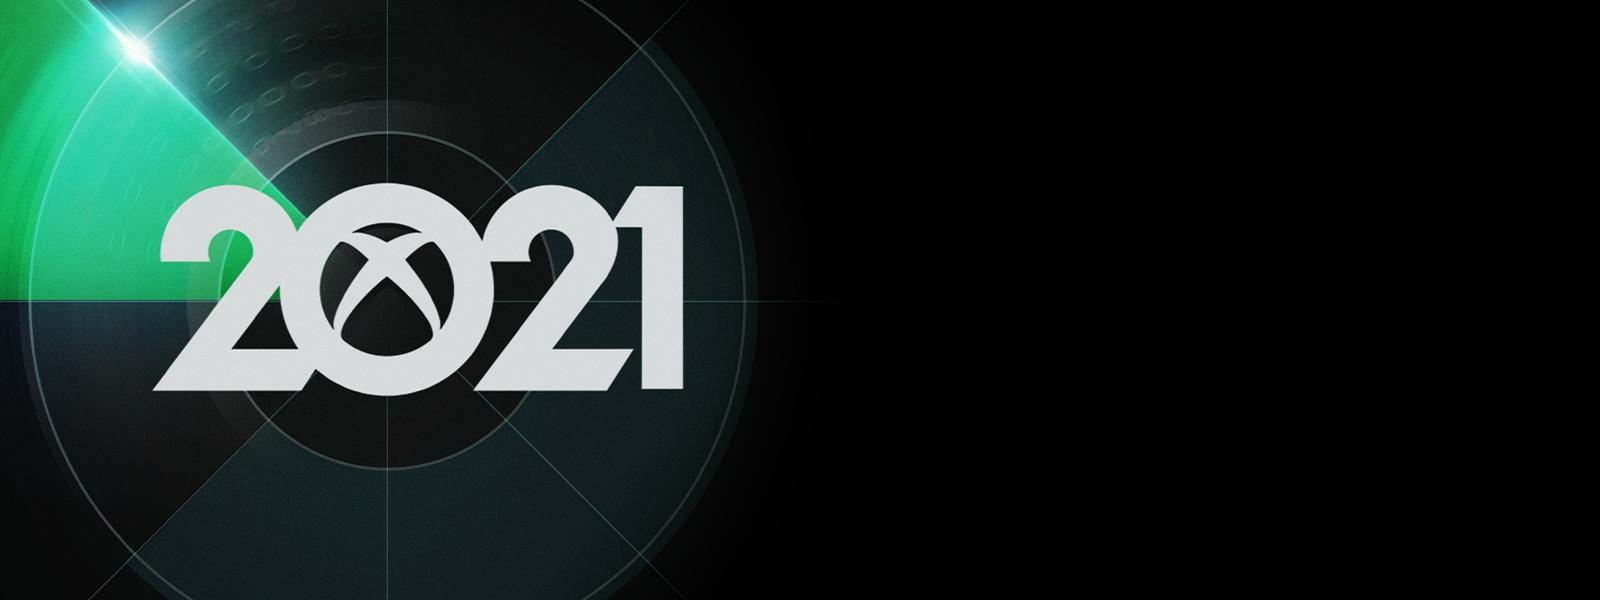 The Xbox & Bethesda Games Showcase 2021 logo.